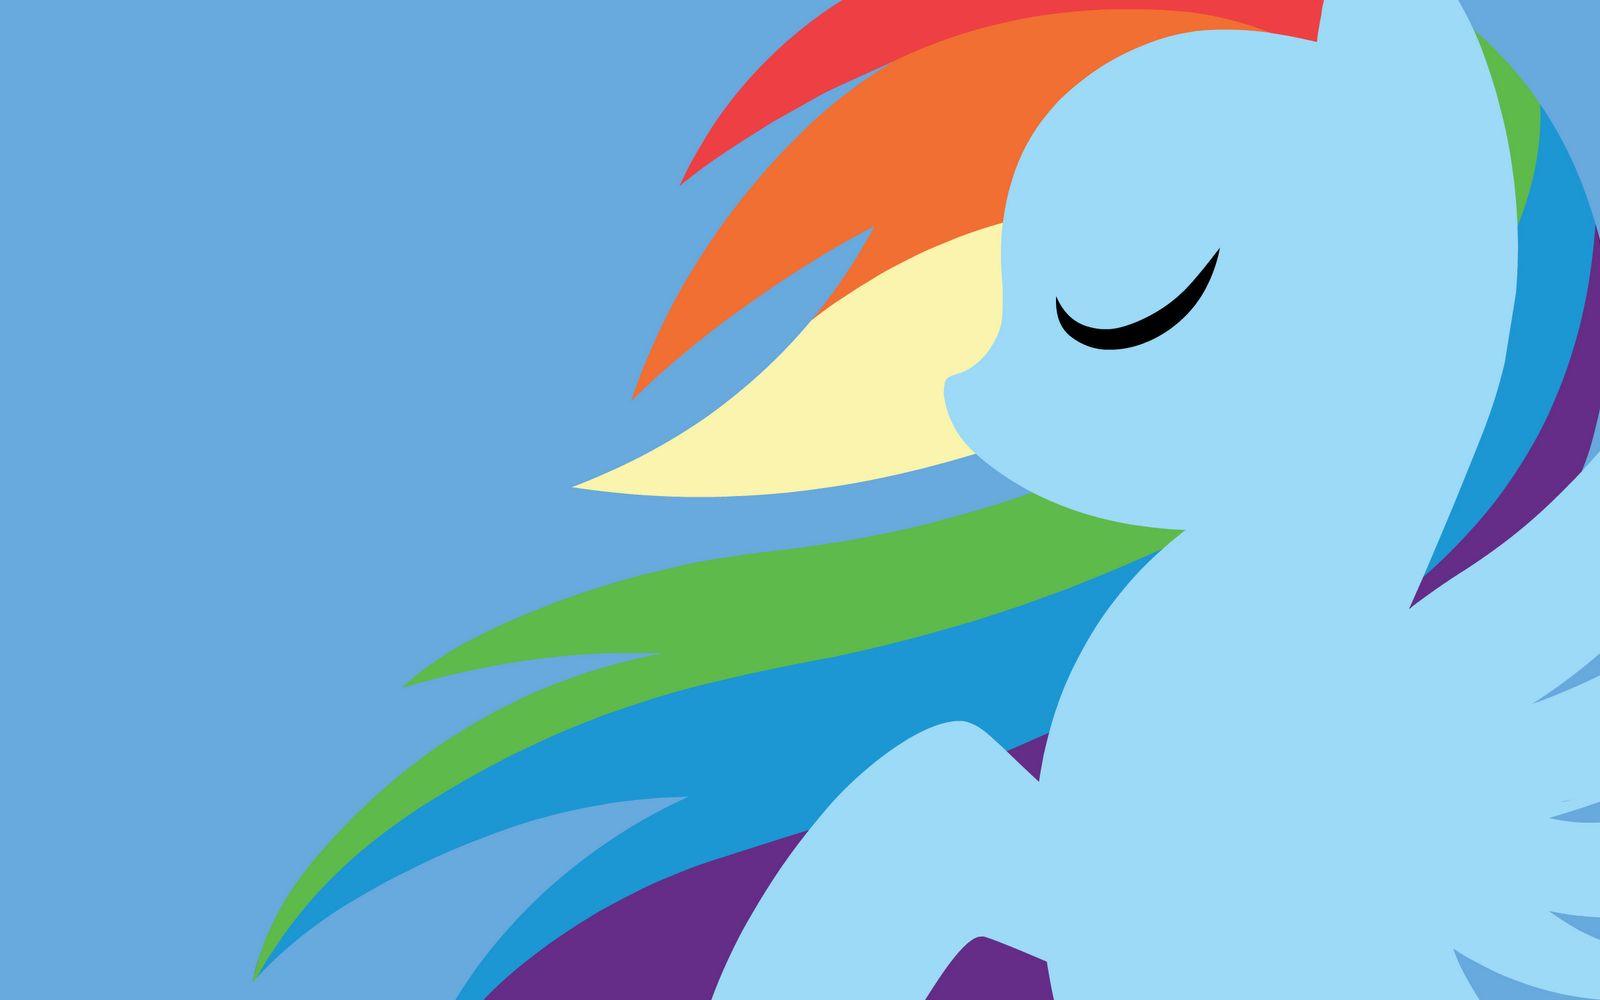 Rainbow Dash Silhouette My Little Pony Episodes My Little Pony